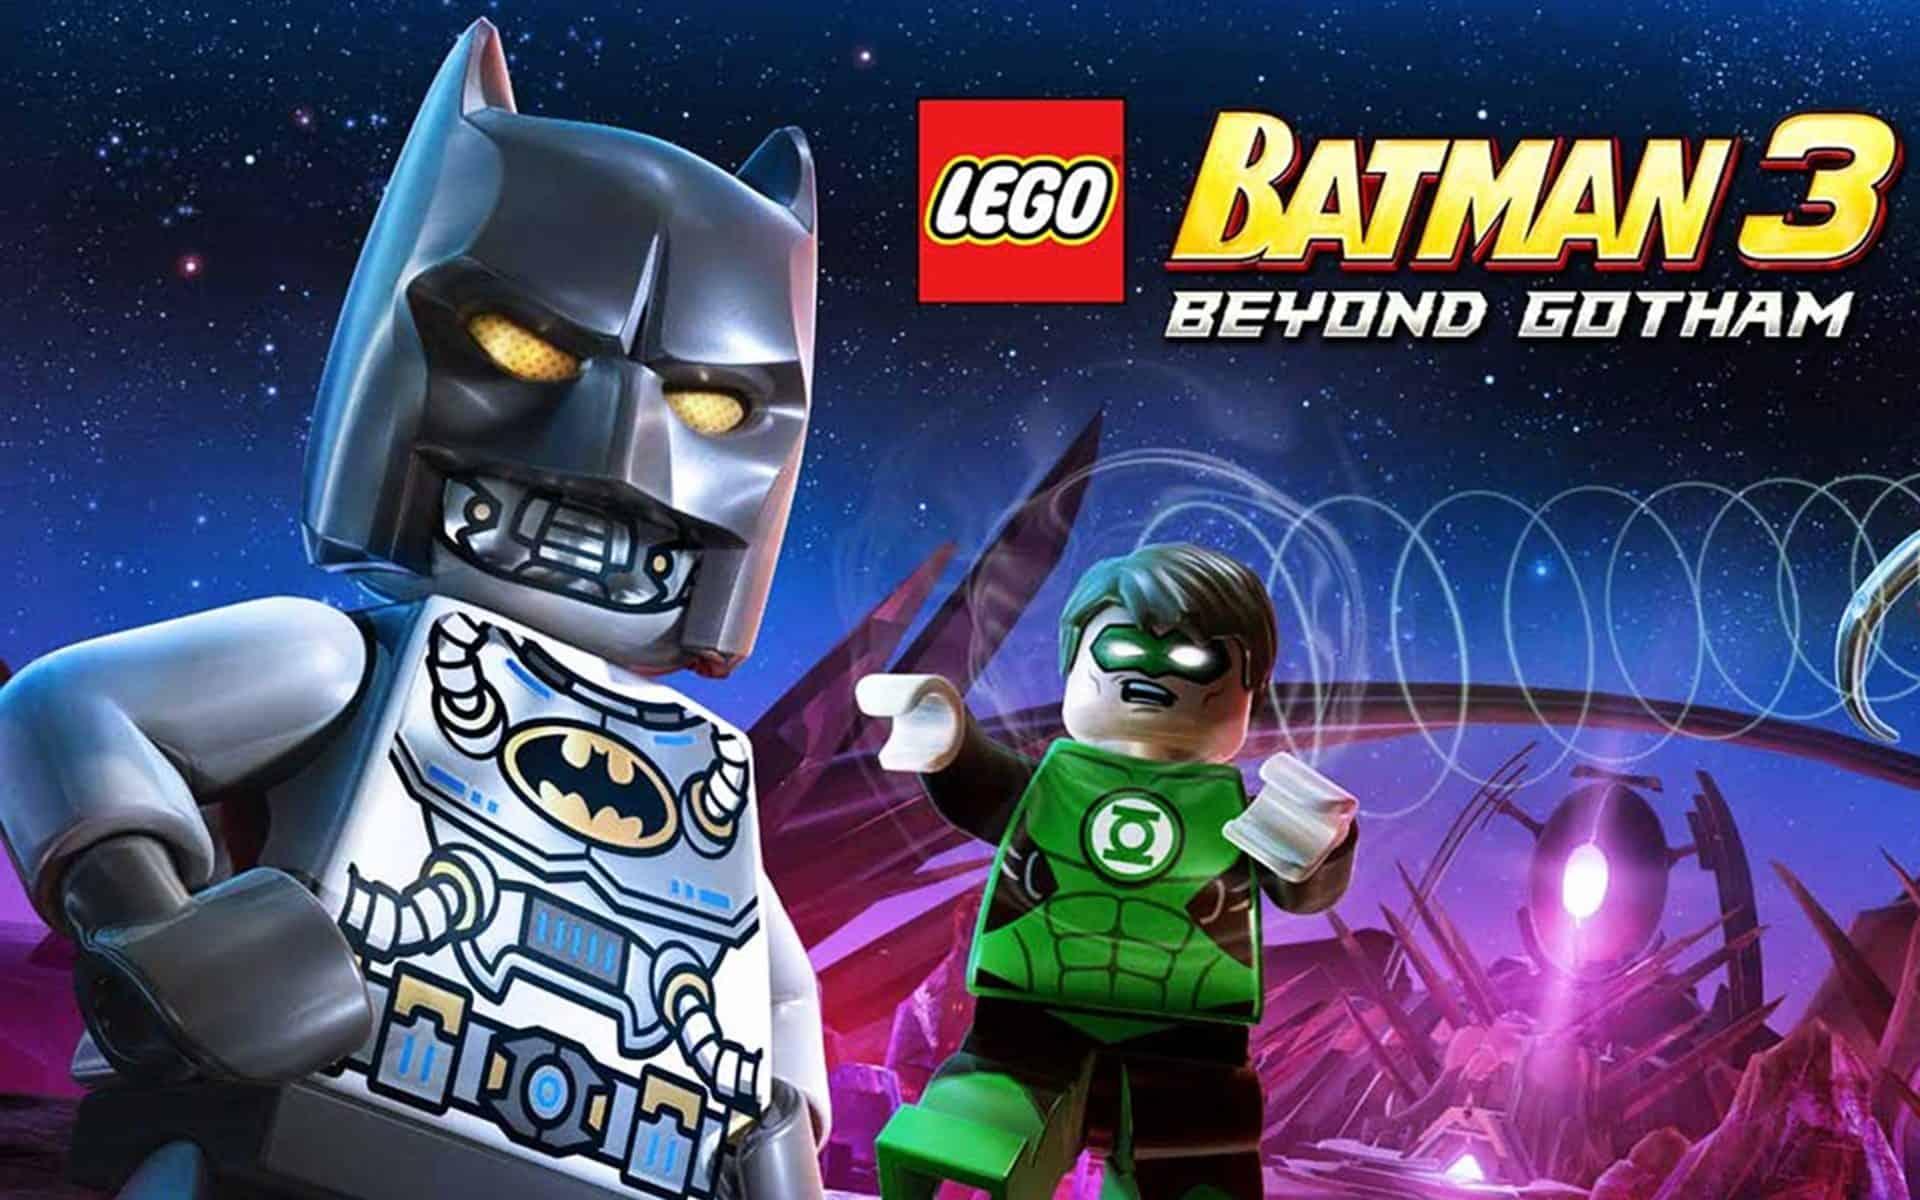 Lego Batman 3 Beyond Gotham PC Latest Version Free Download